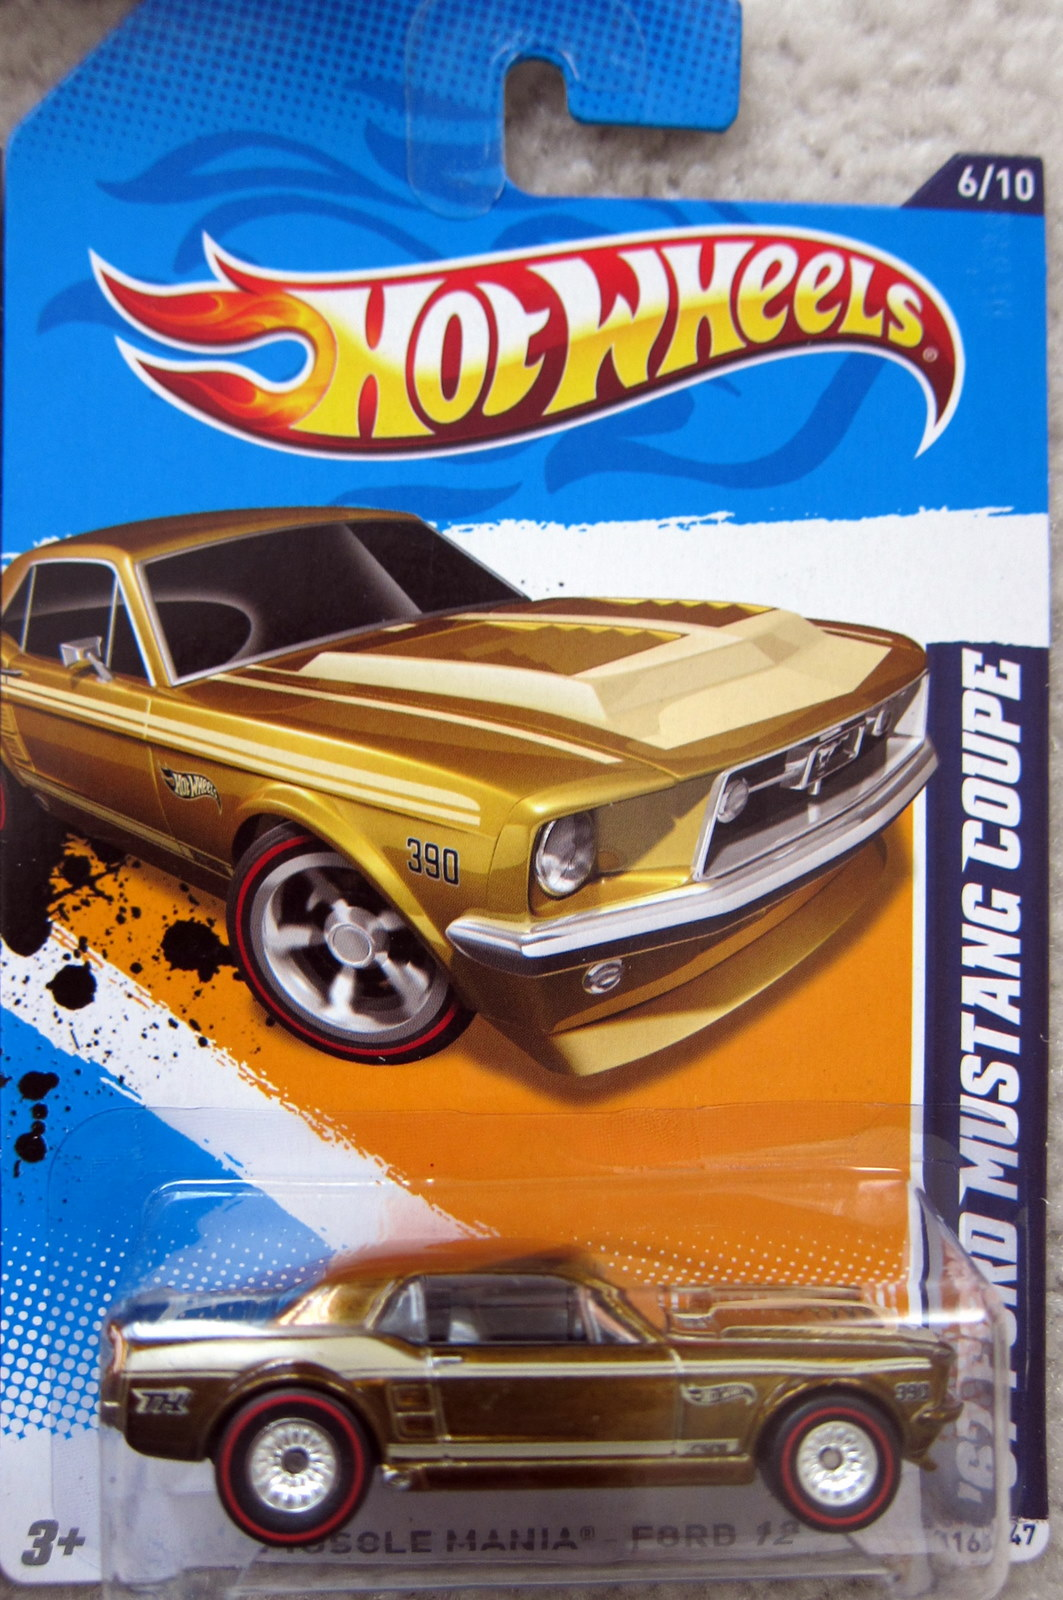 mytoycars hot wheels 2012 treasure hunts. Black Bedroom Furniture Sets. Home Design Ideas